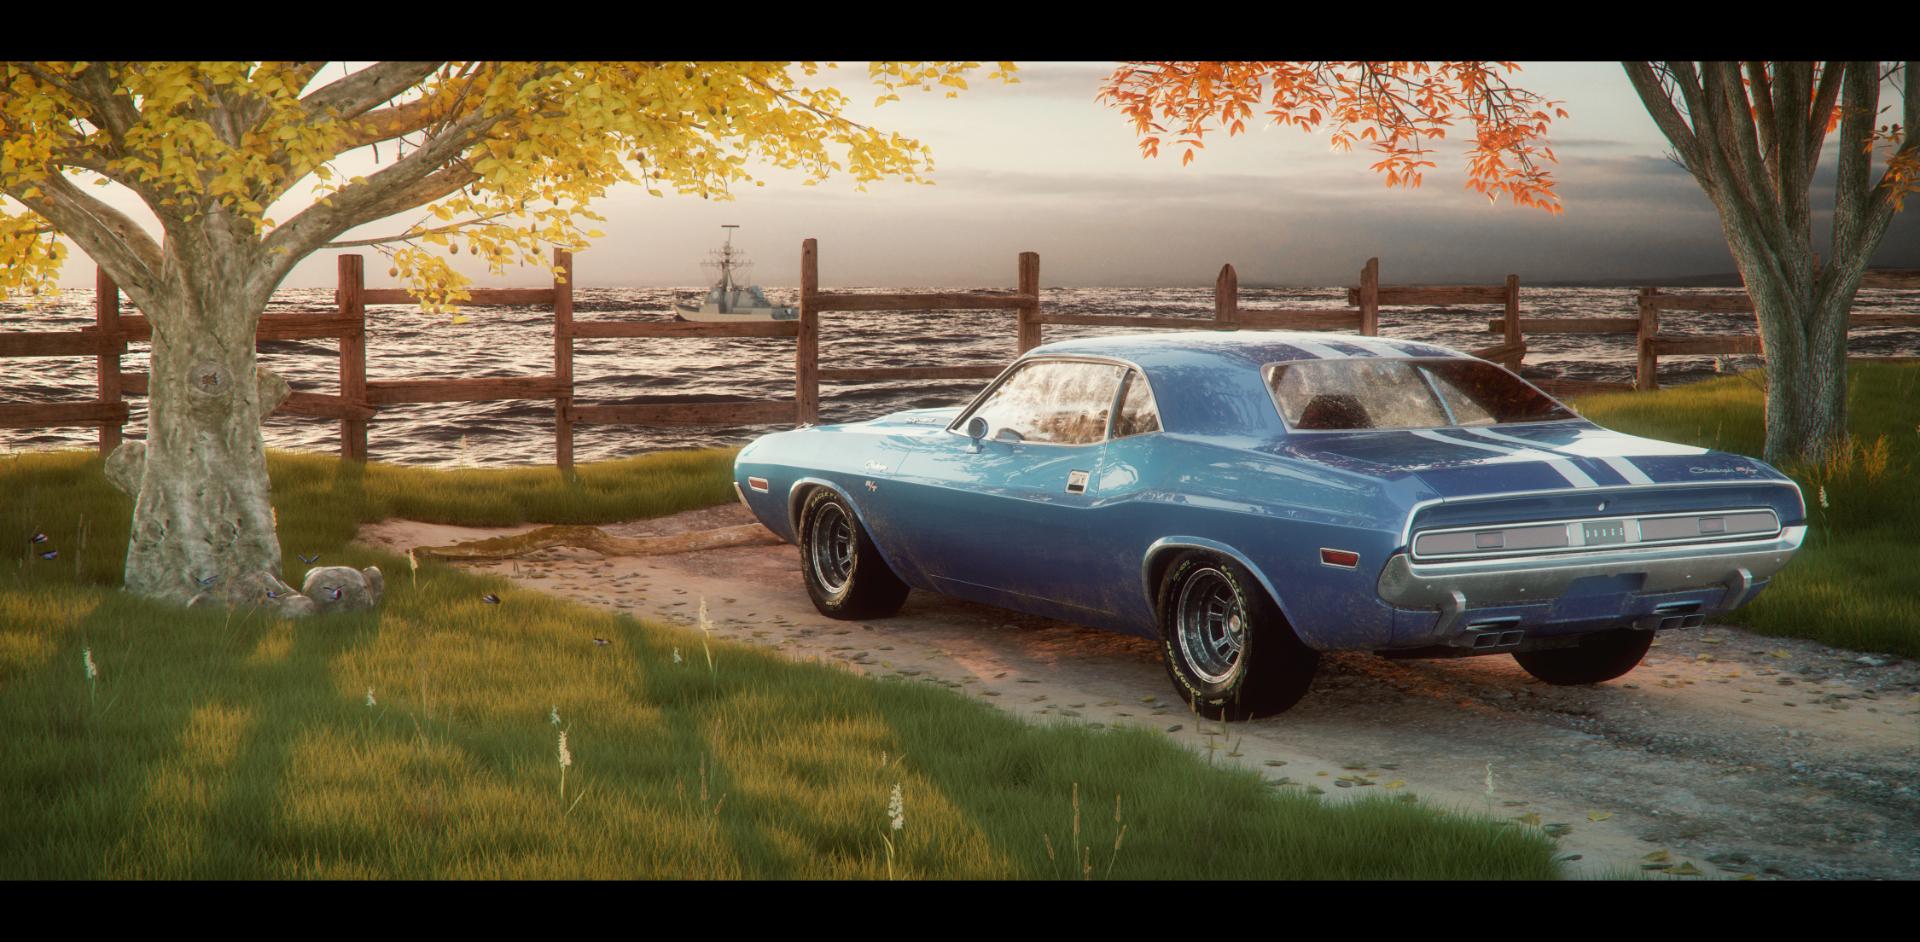 Car Render Challenge 2017 - Dodge challenger r/t